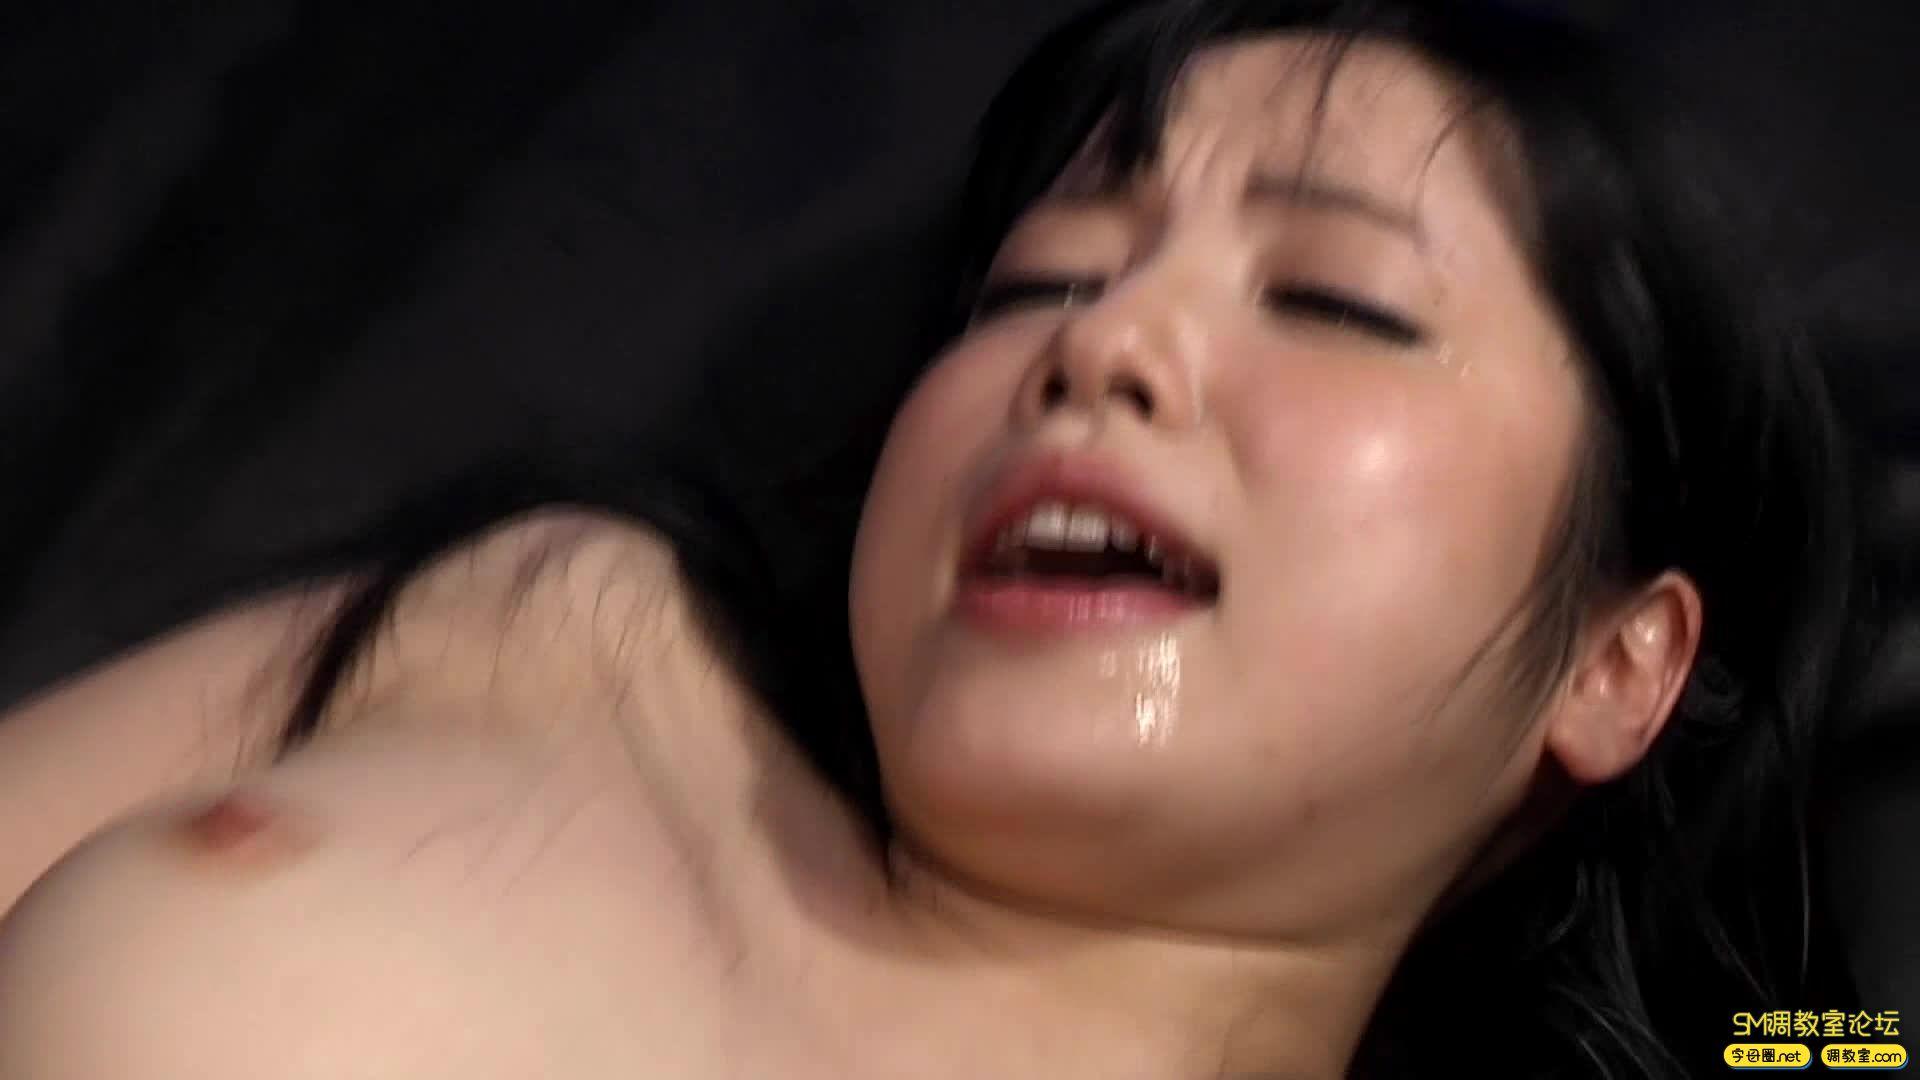 [Dogma合集] - DDT-449 - 拘束椅子トランス みなみ愛梨-视频截图7